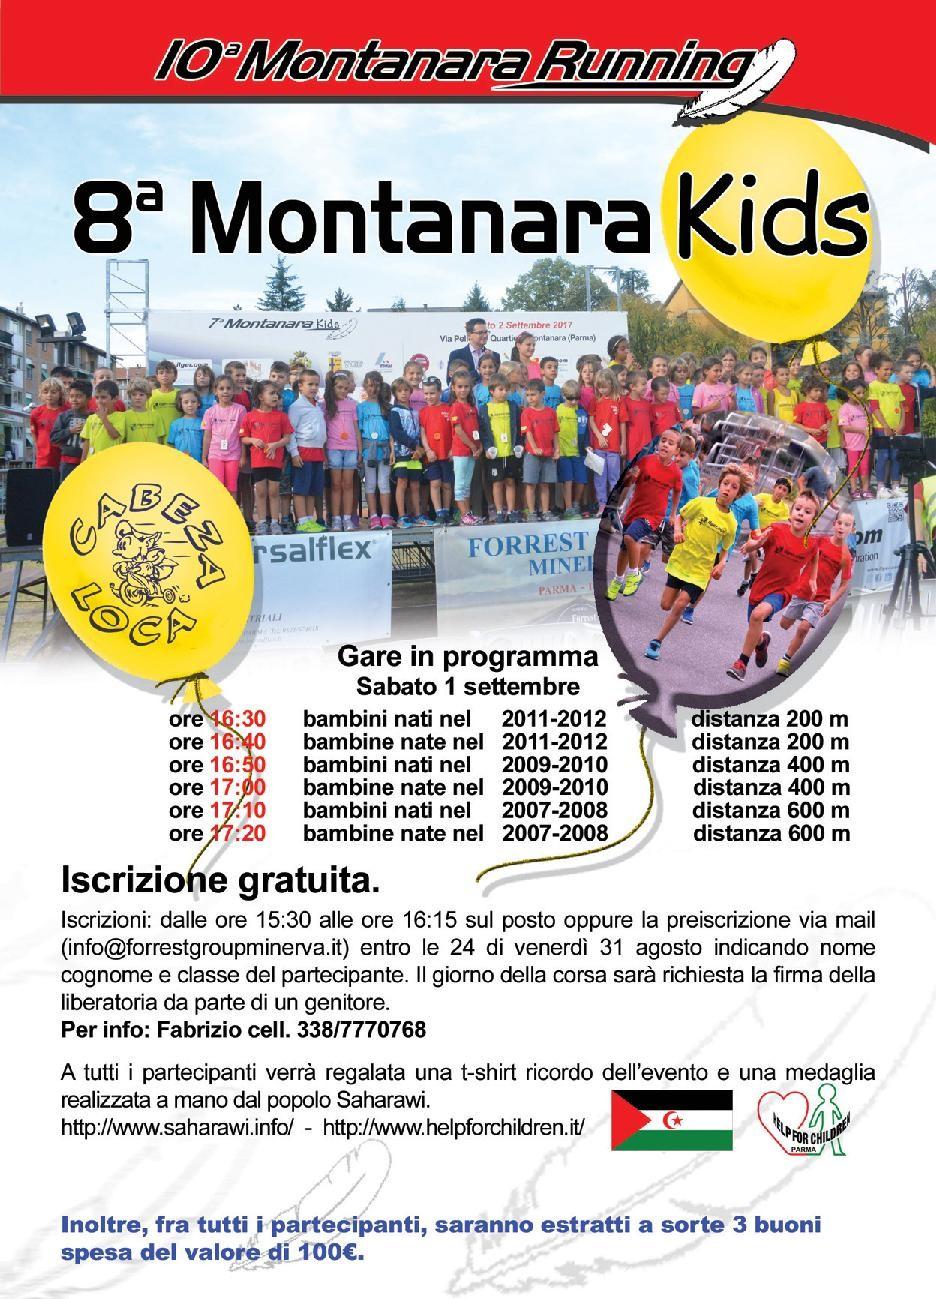 Montanara Kids